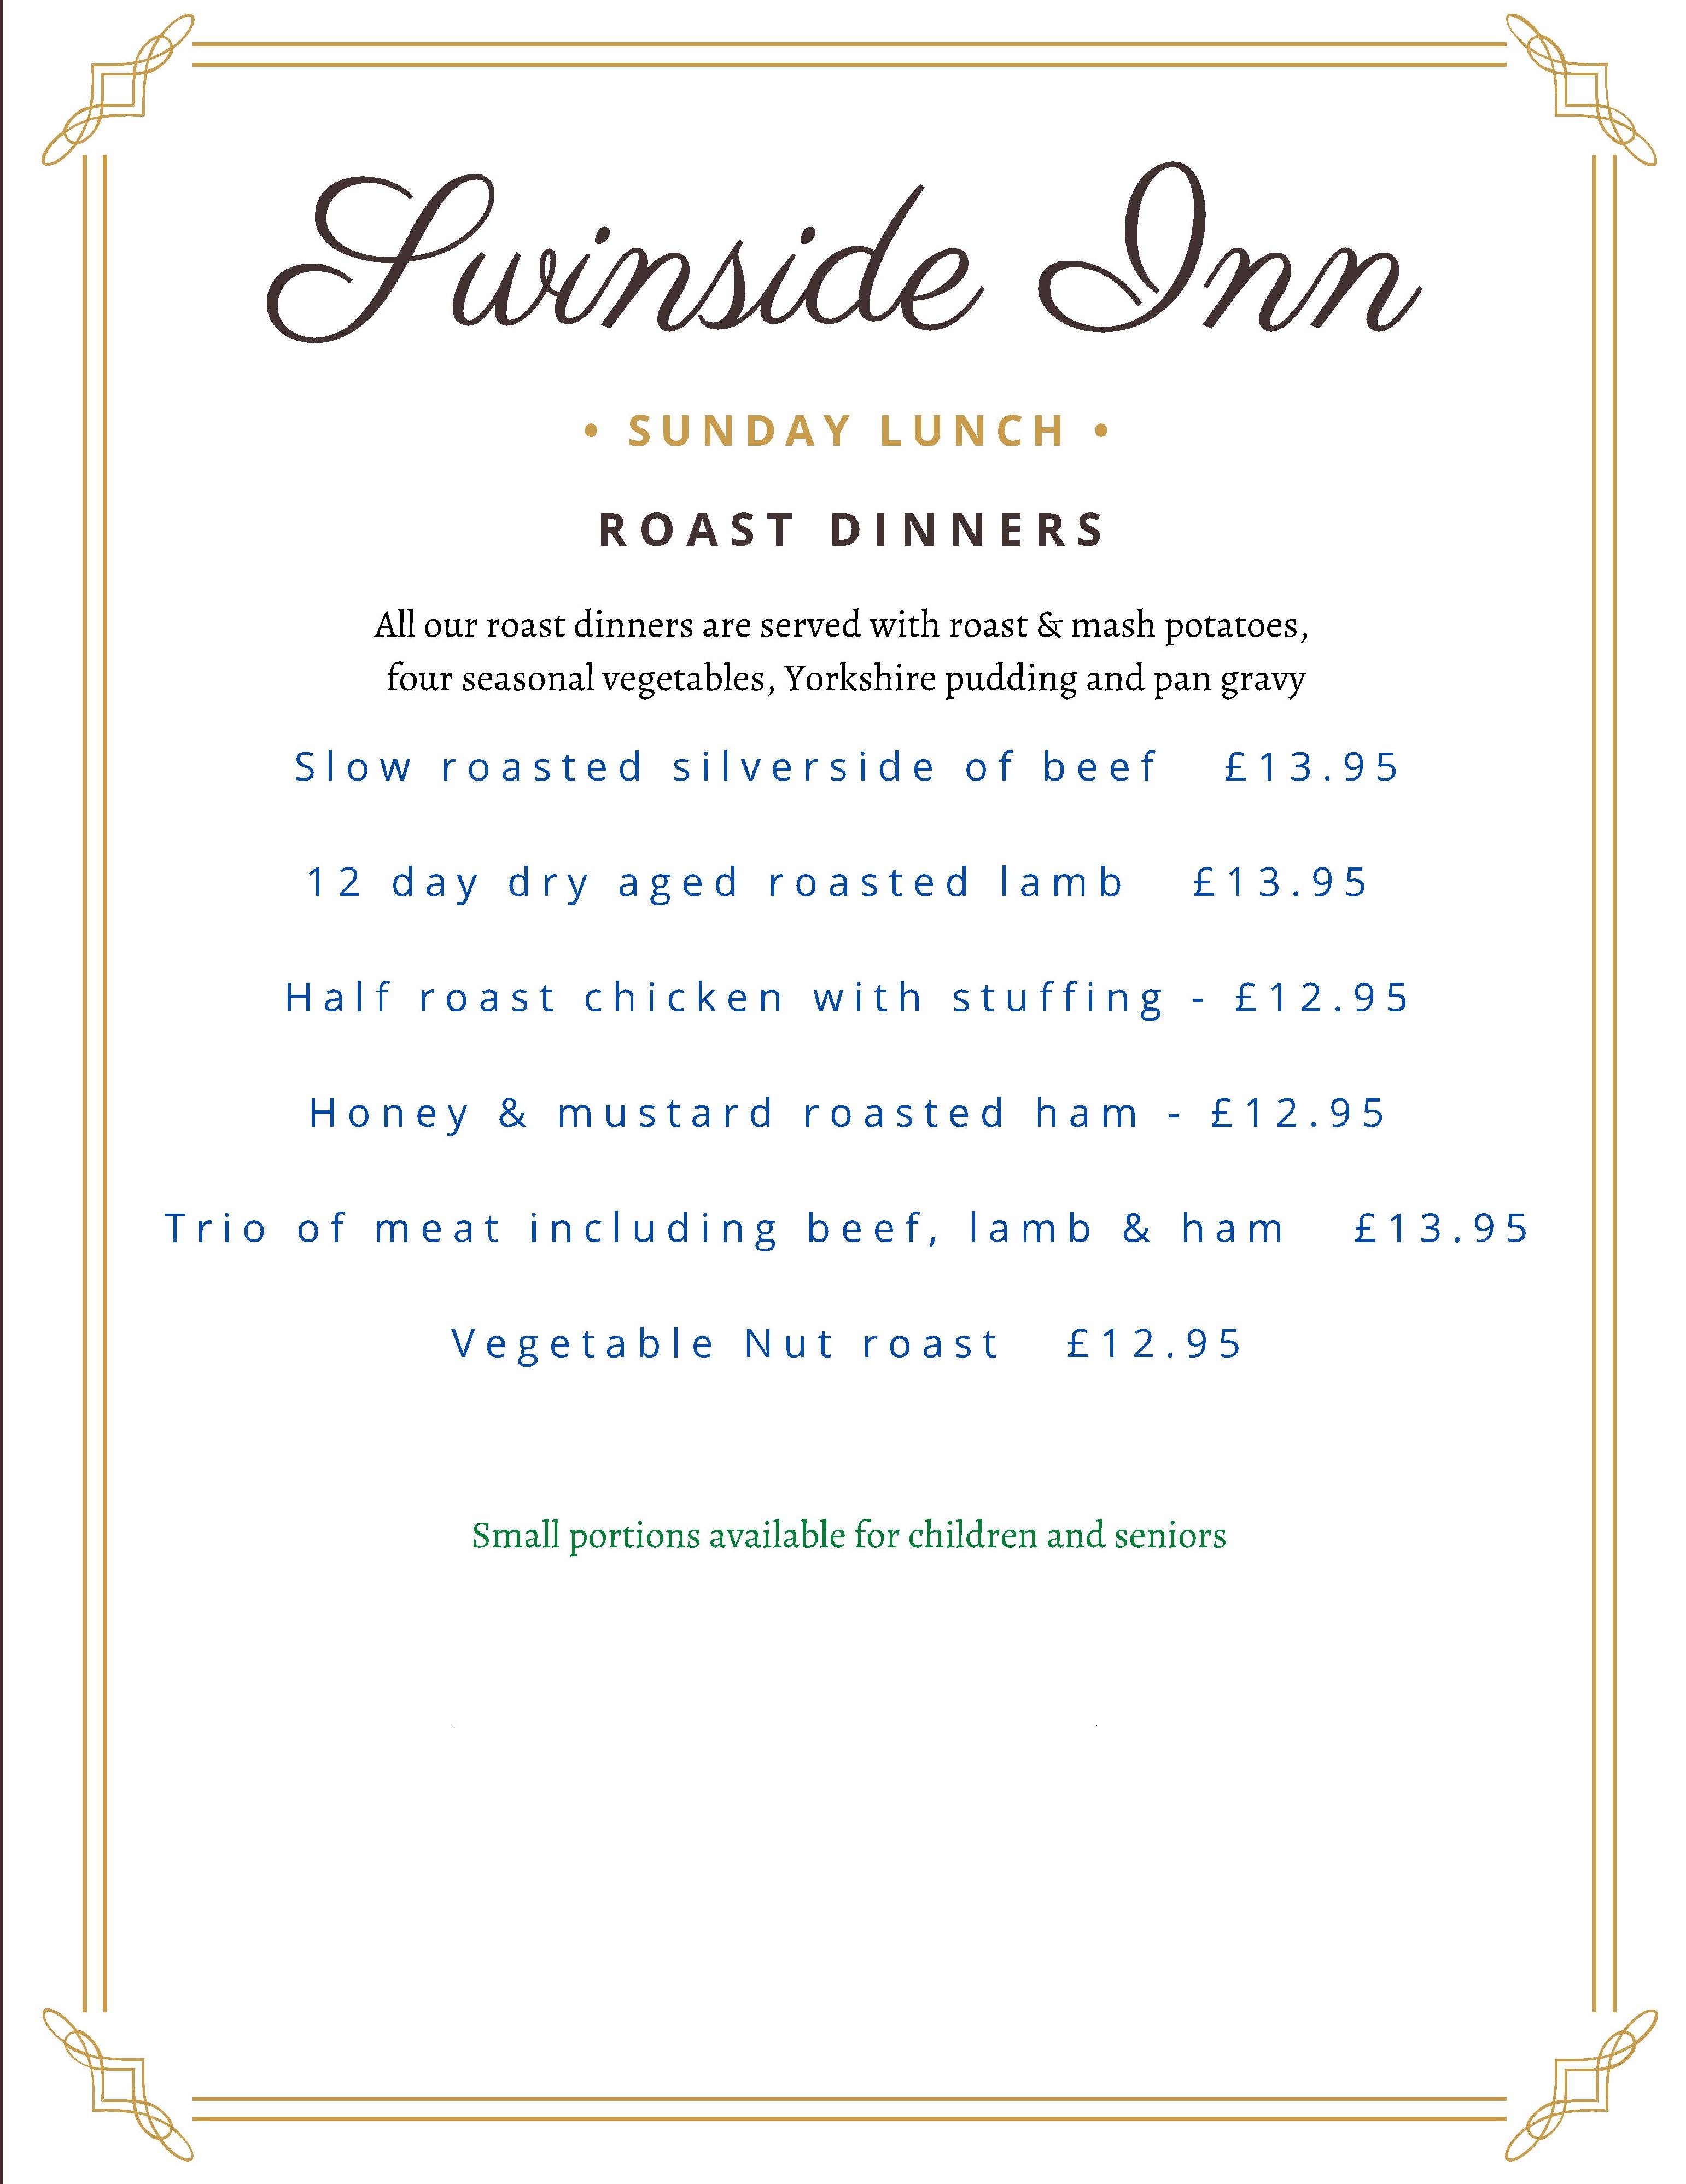 photo of Sunday menu at The Swinside Inn